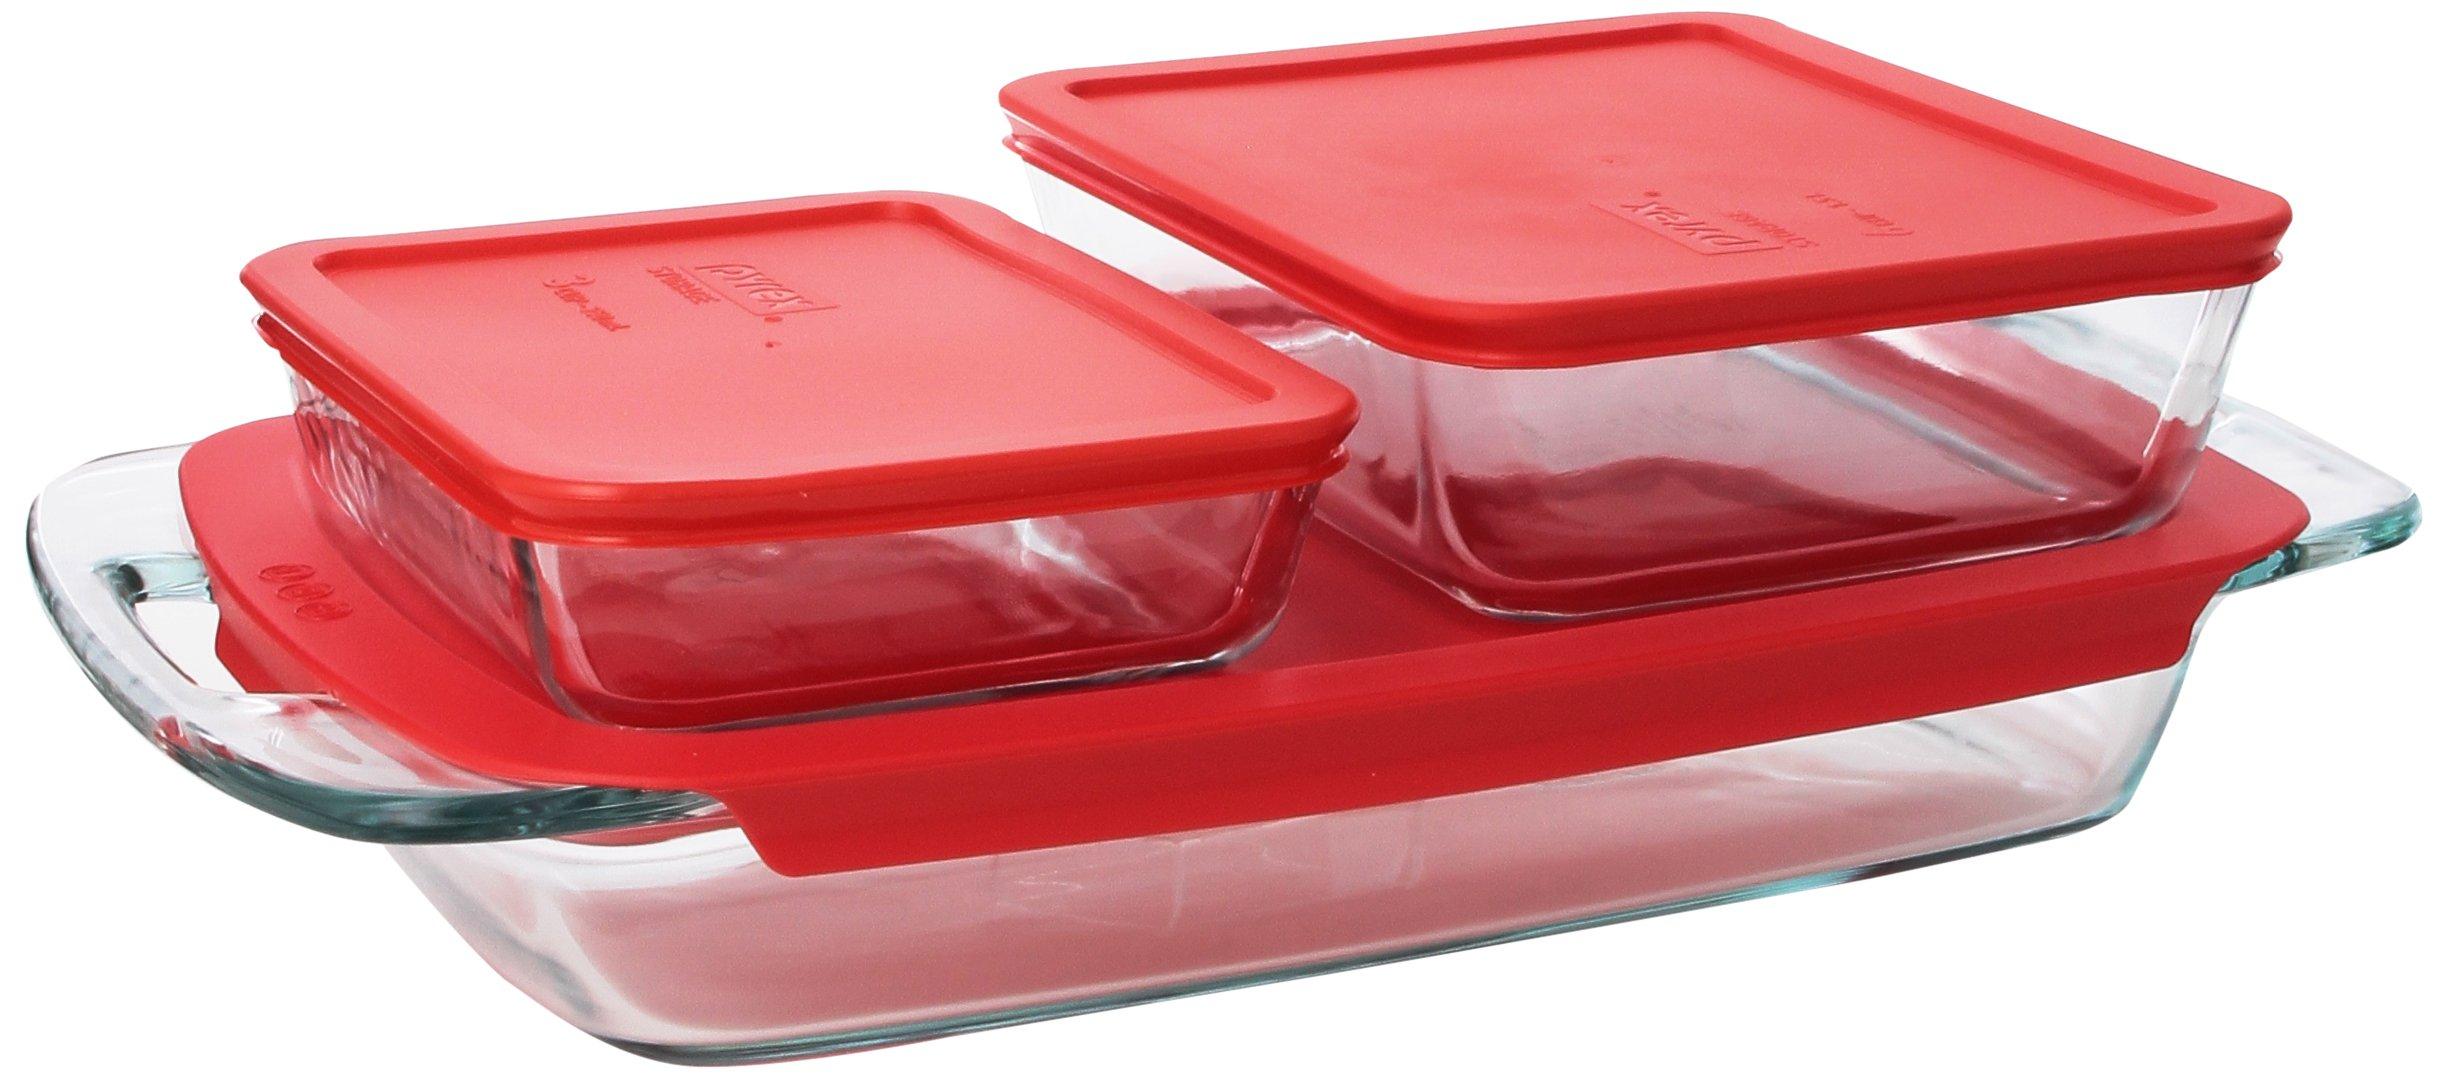 pyrex easy grab 6 piece glass bakeware and food storage set red lid pyrex. Black Bedroom Furniture Sets. Home Design Ideas